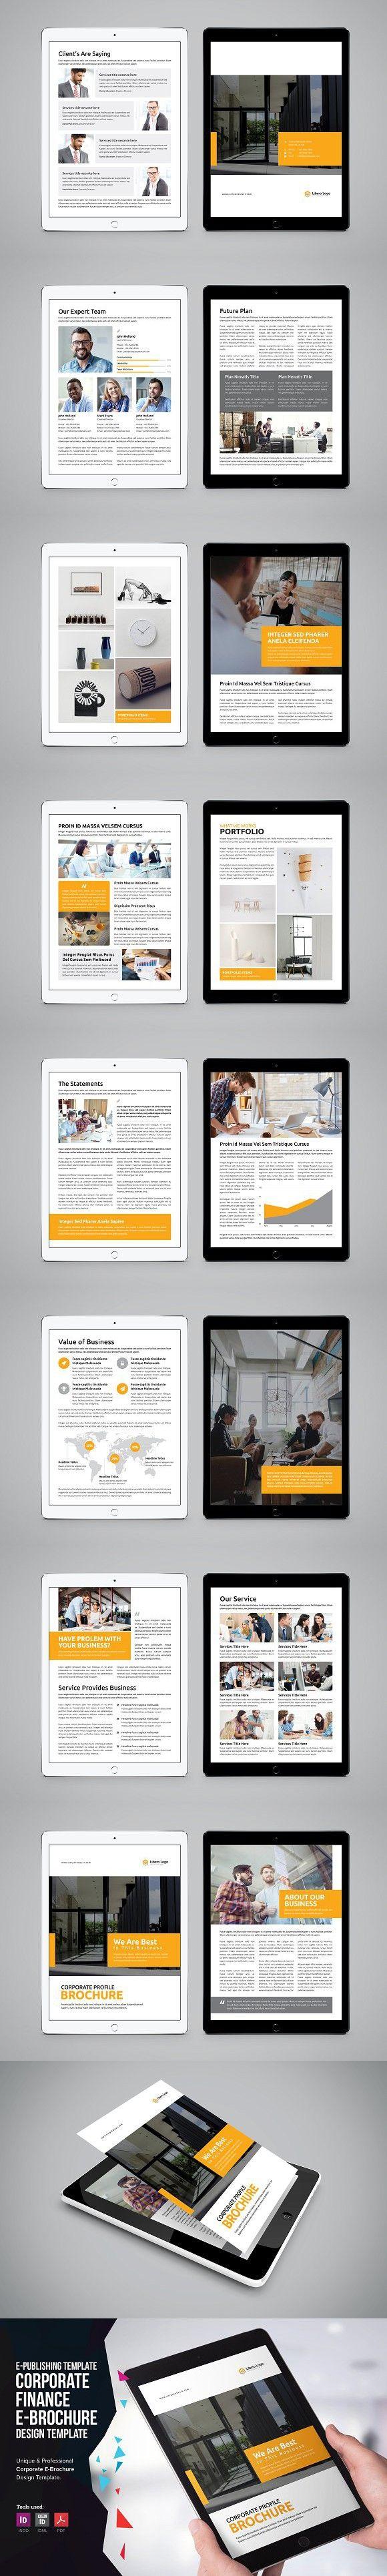 e book corporate e brochure v1 brochure templates pinterest